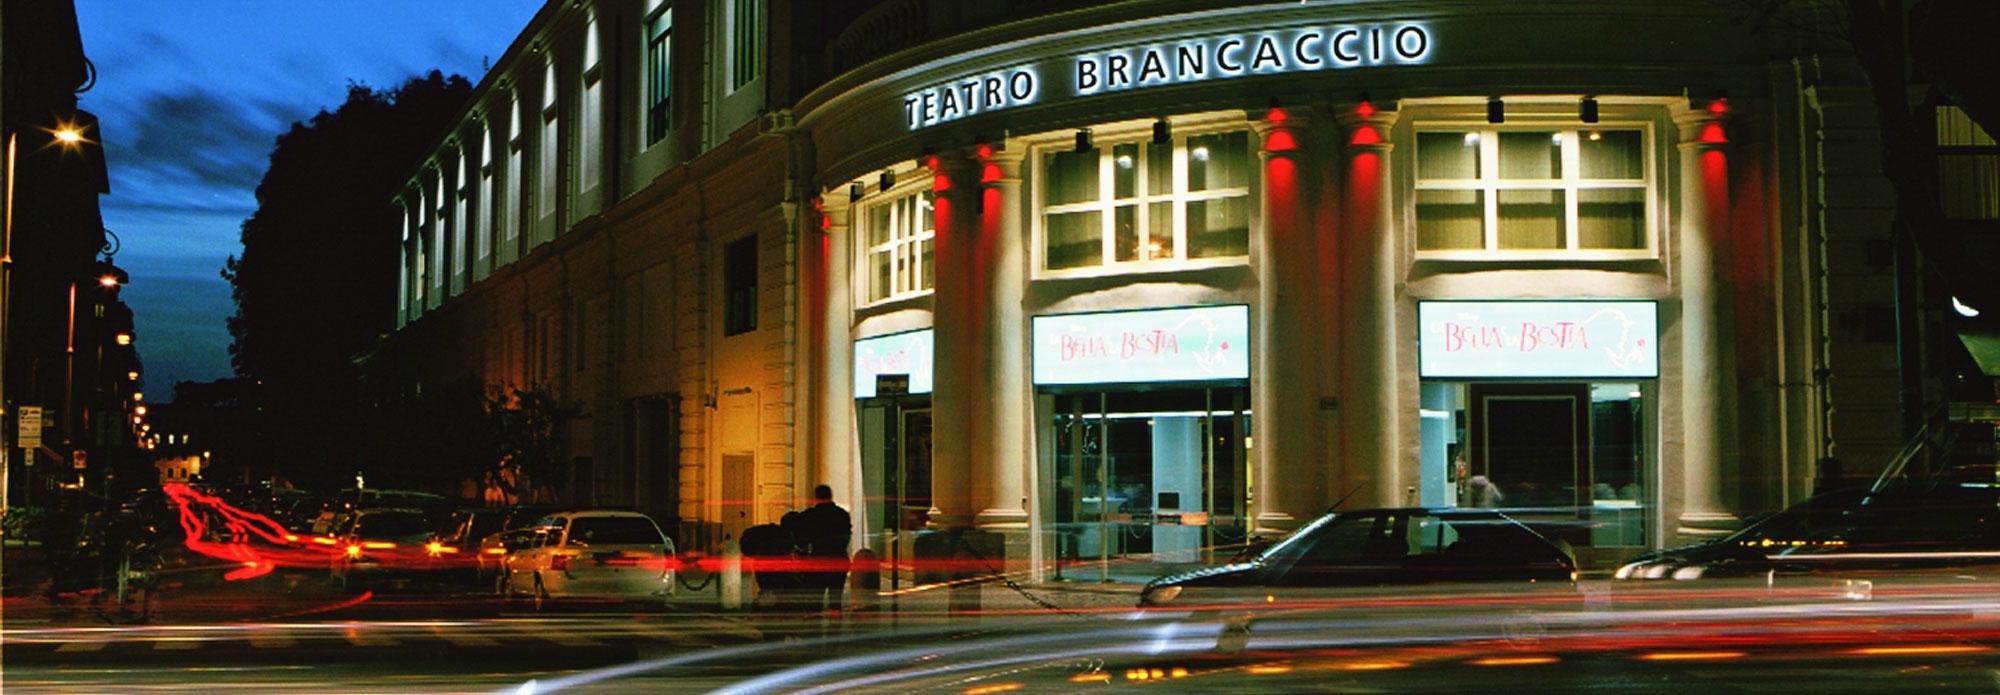 01_homepage_02romaBRANCACCIO